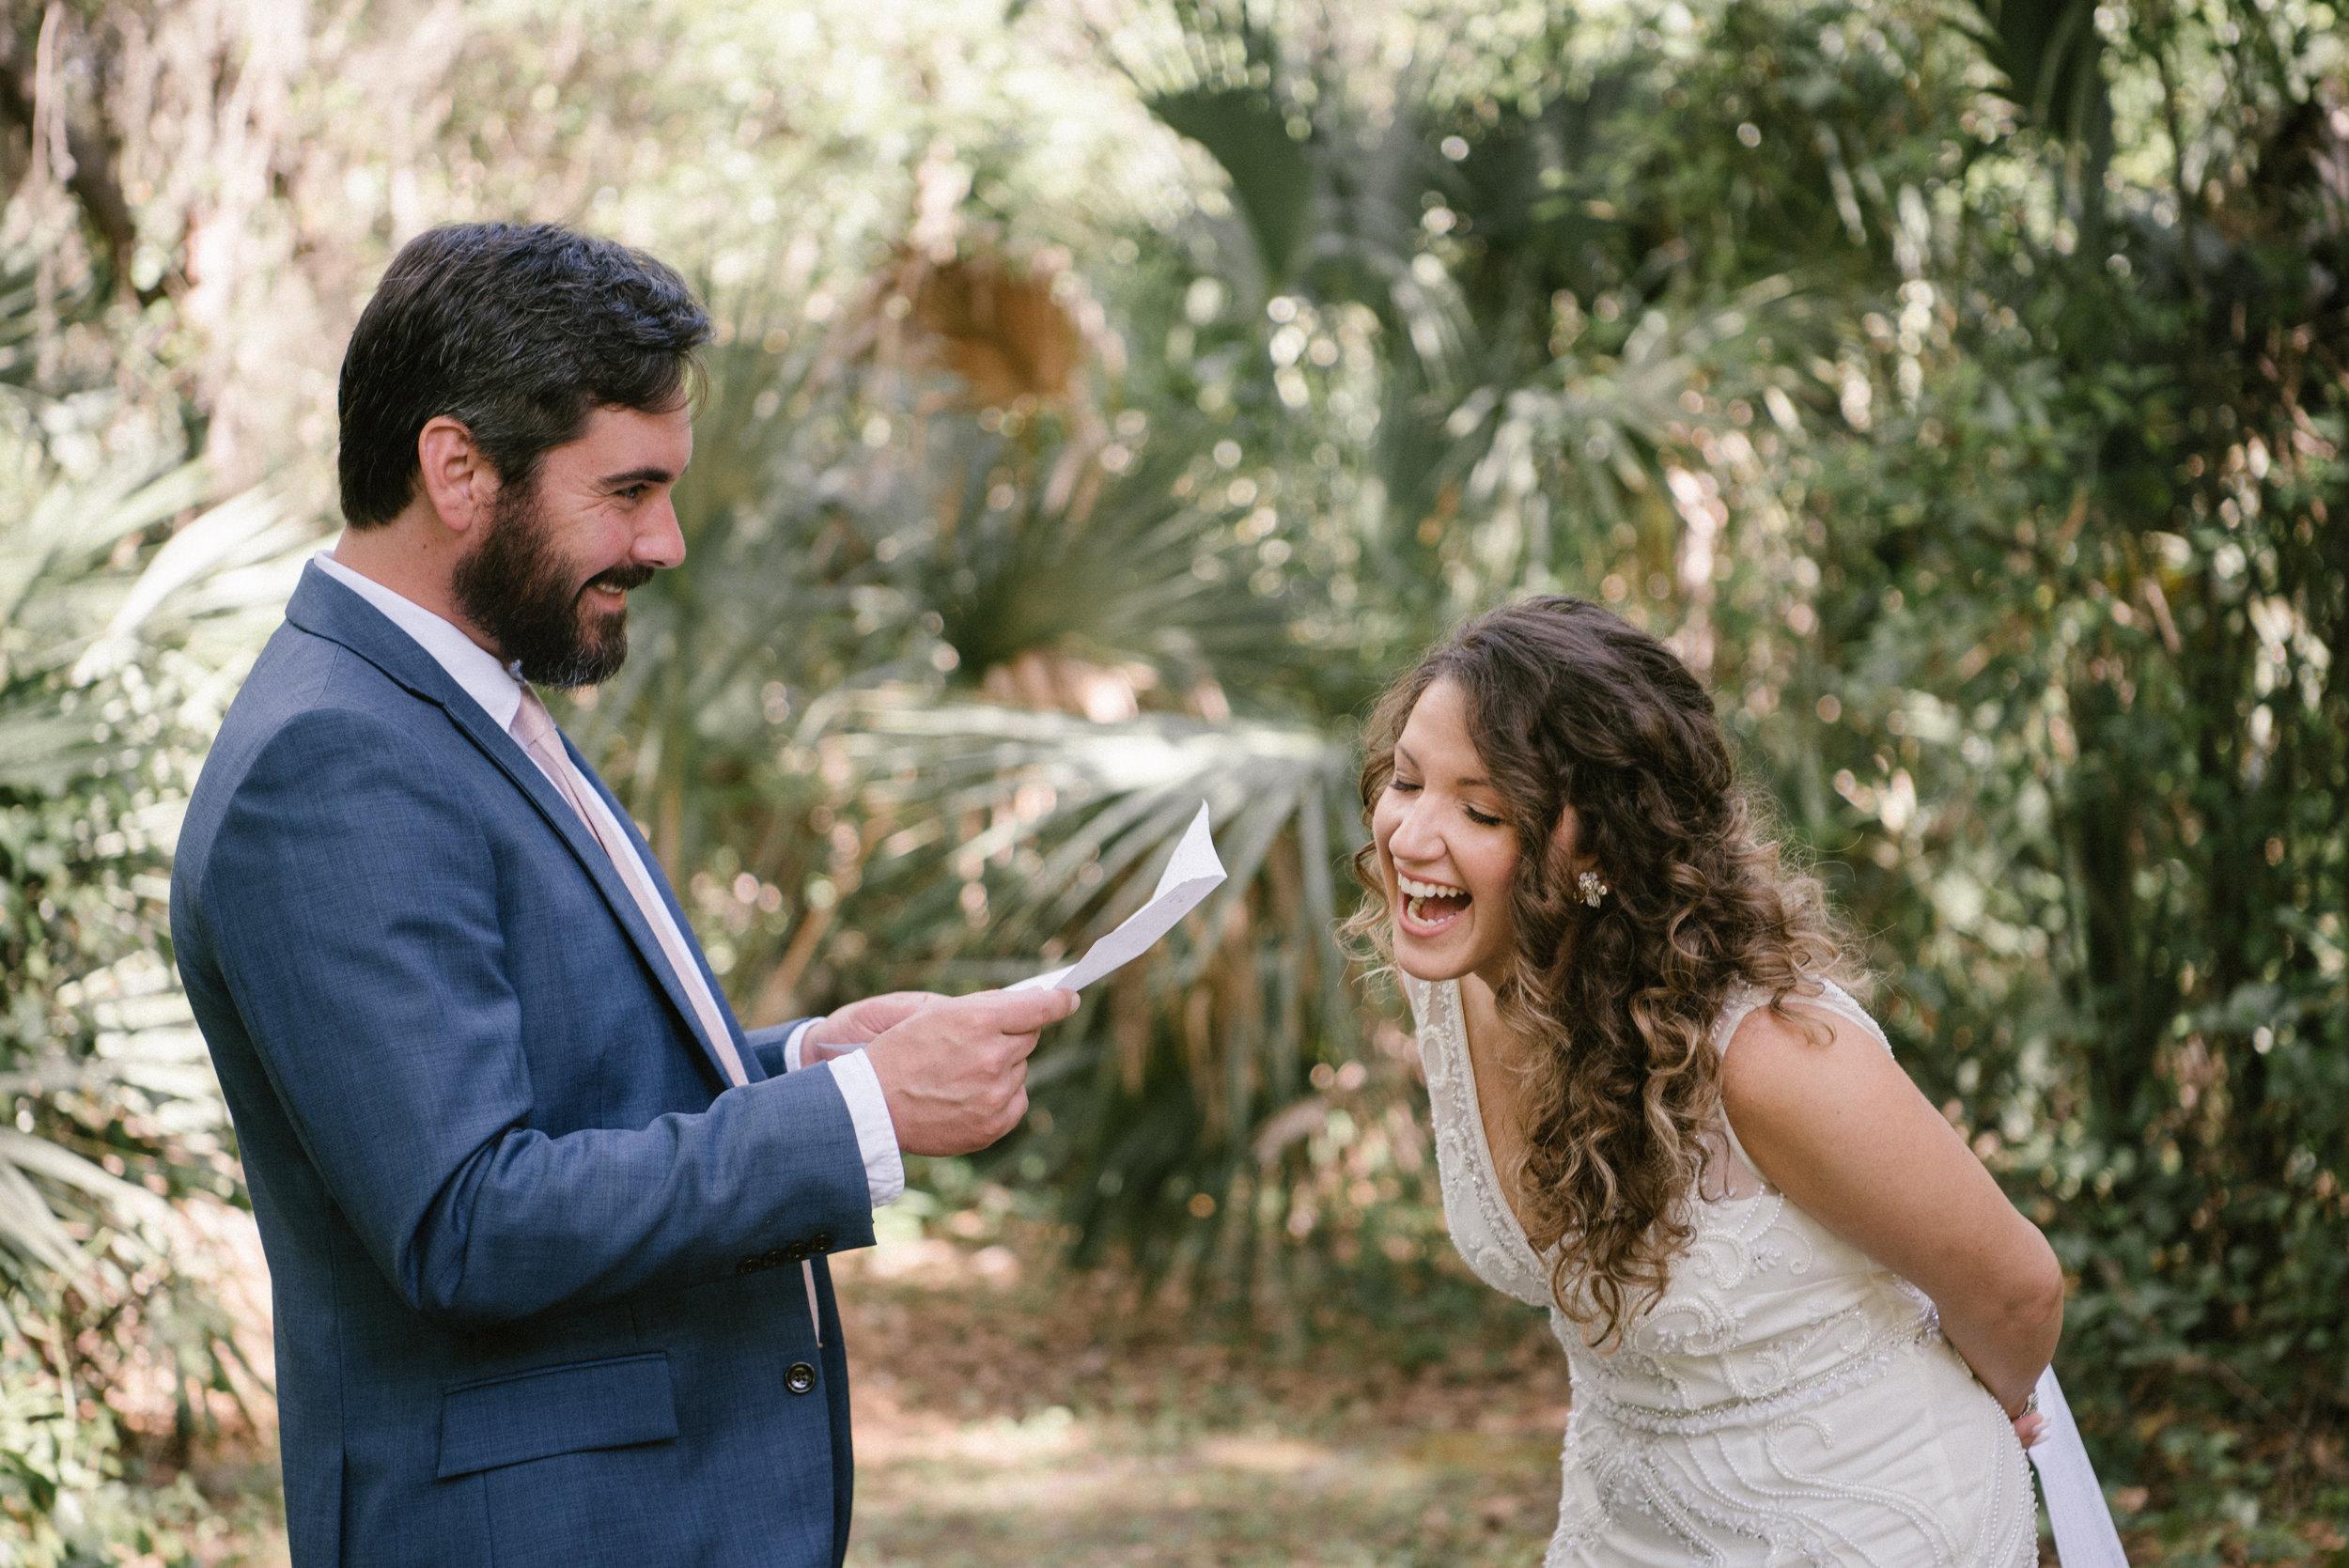 mclaughlin-wedding-278.jpg